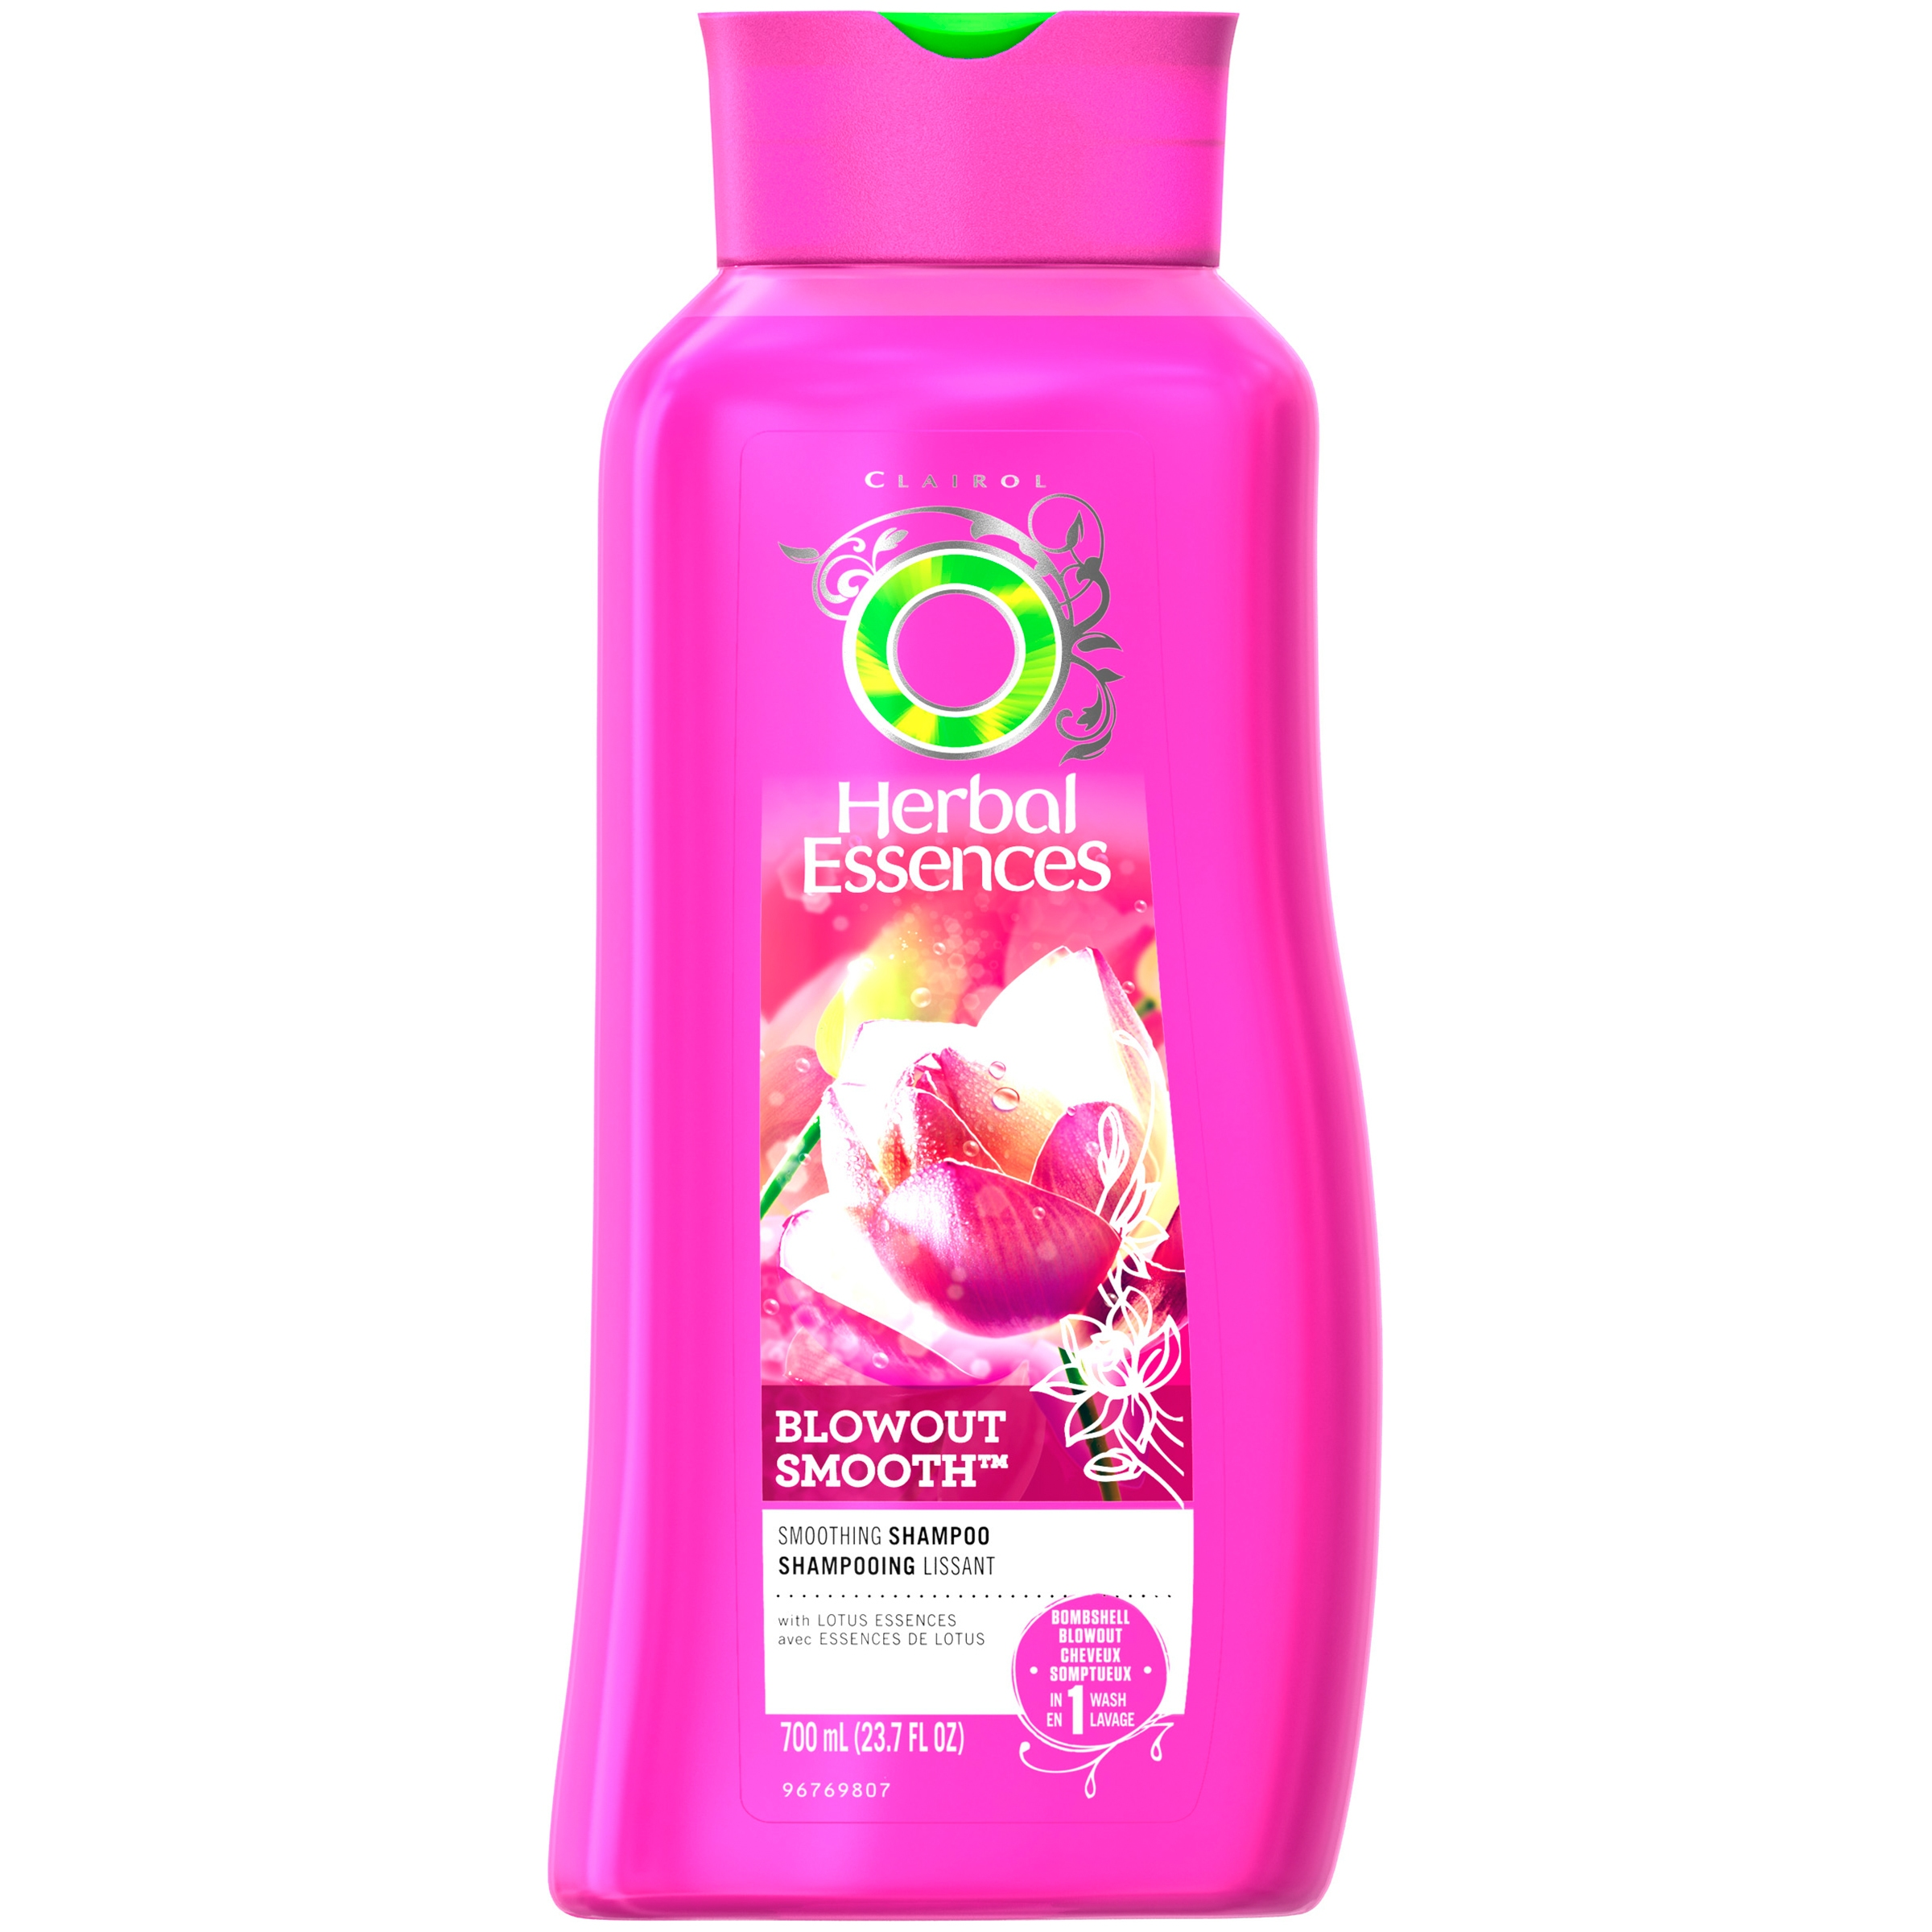 Herbal Essences Blowout Smooth Shampoo, 23.7 Oz